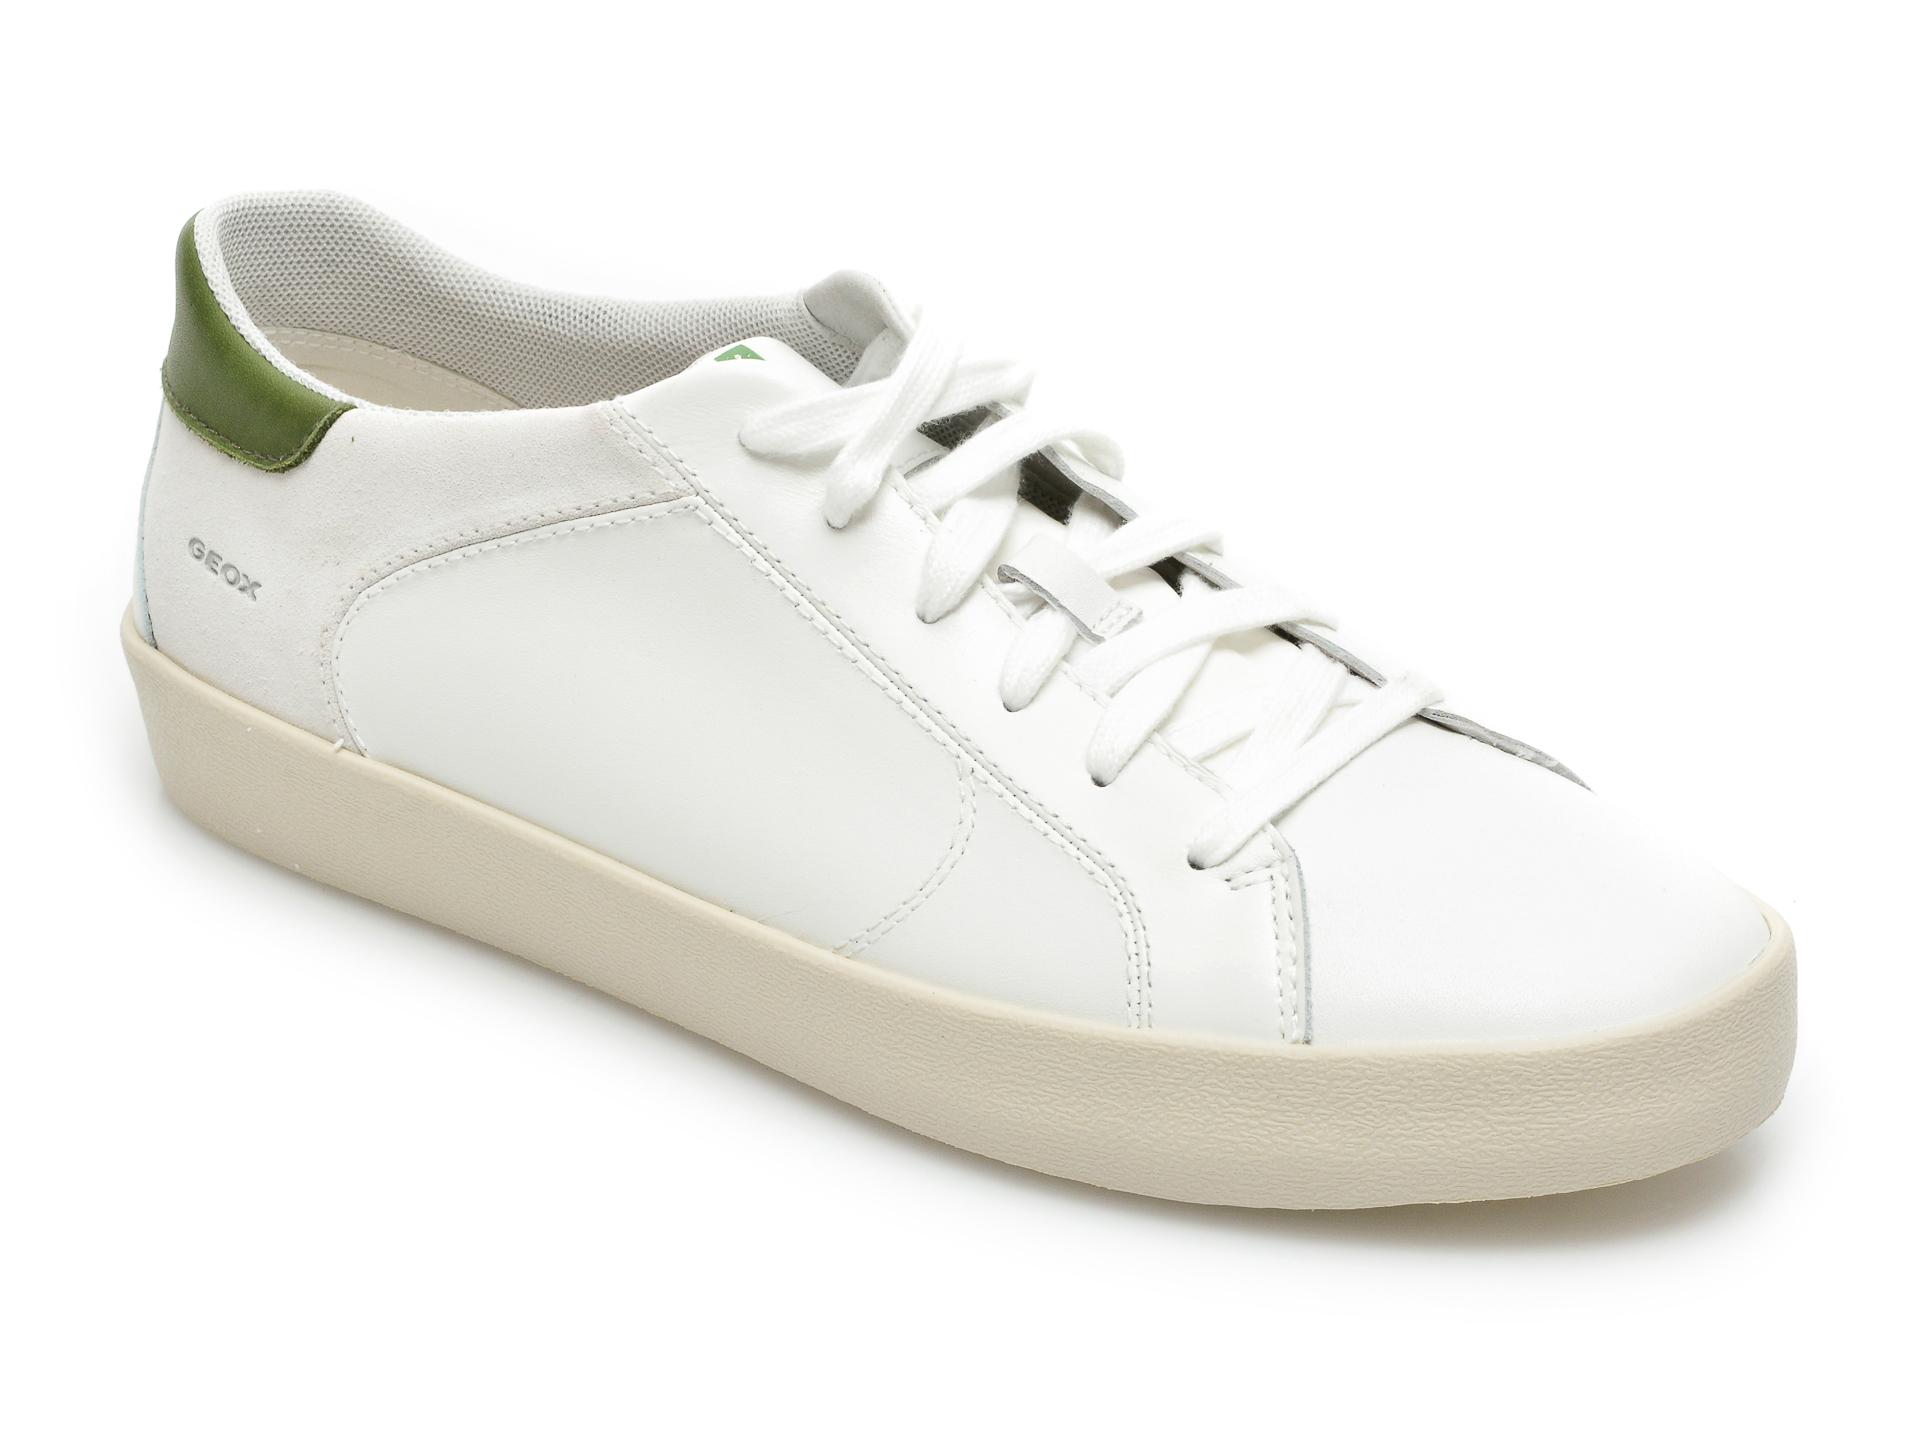 Pantofi sport GEOX albi, U156HA, din piele naturala